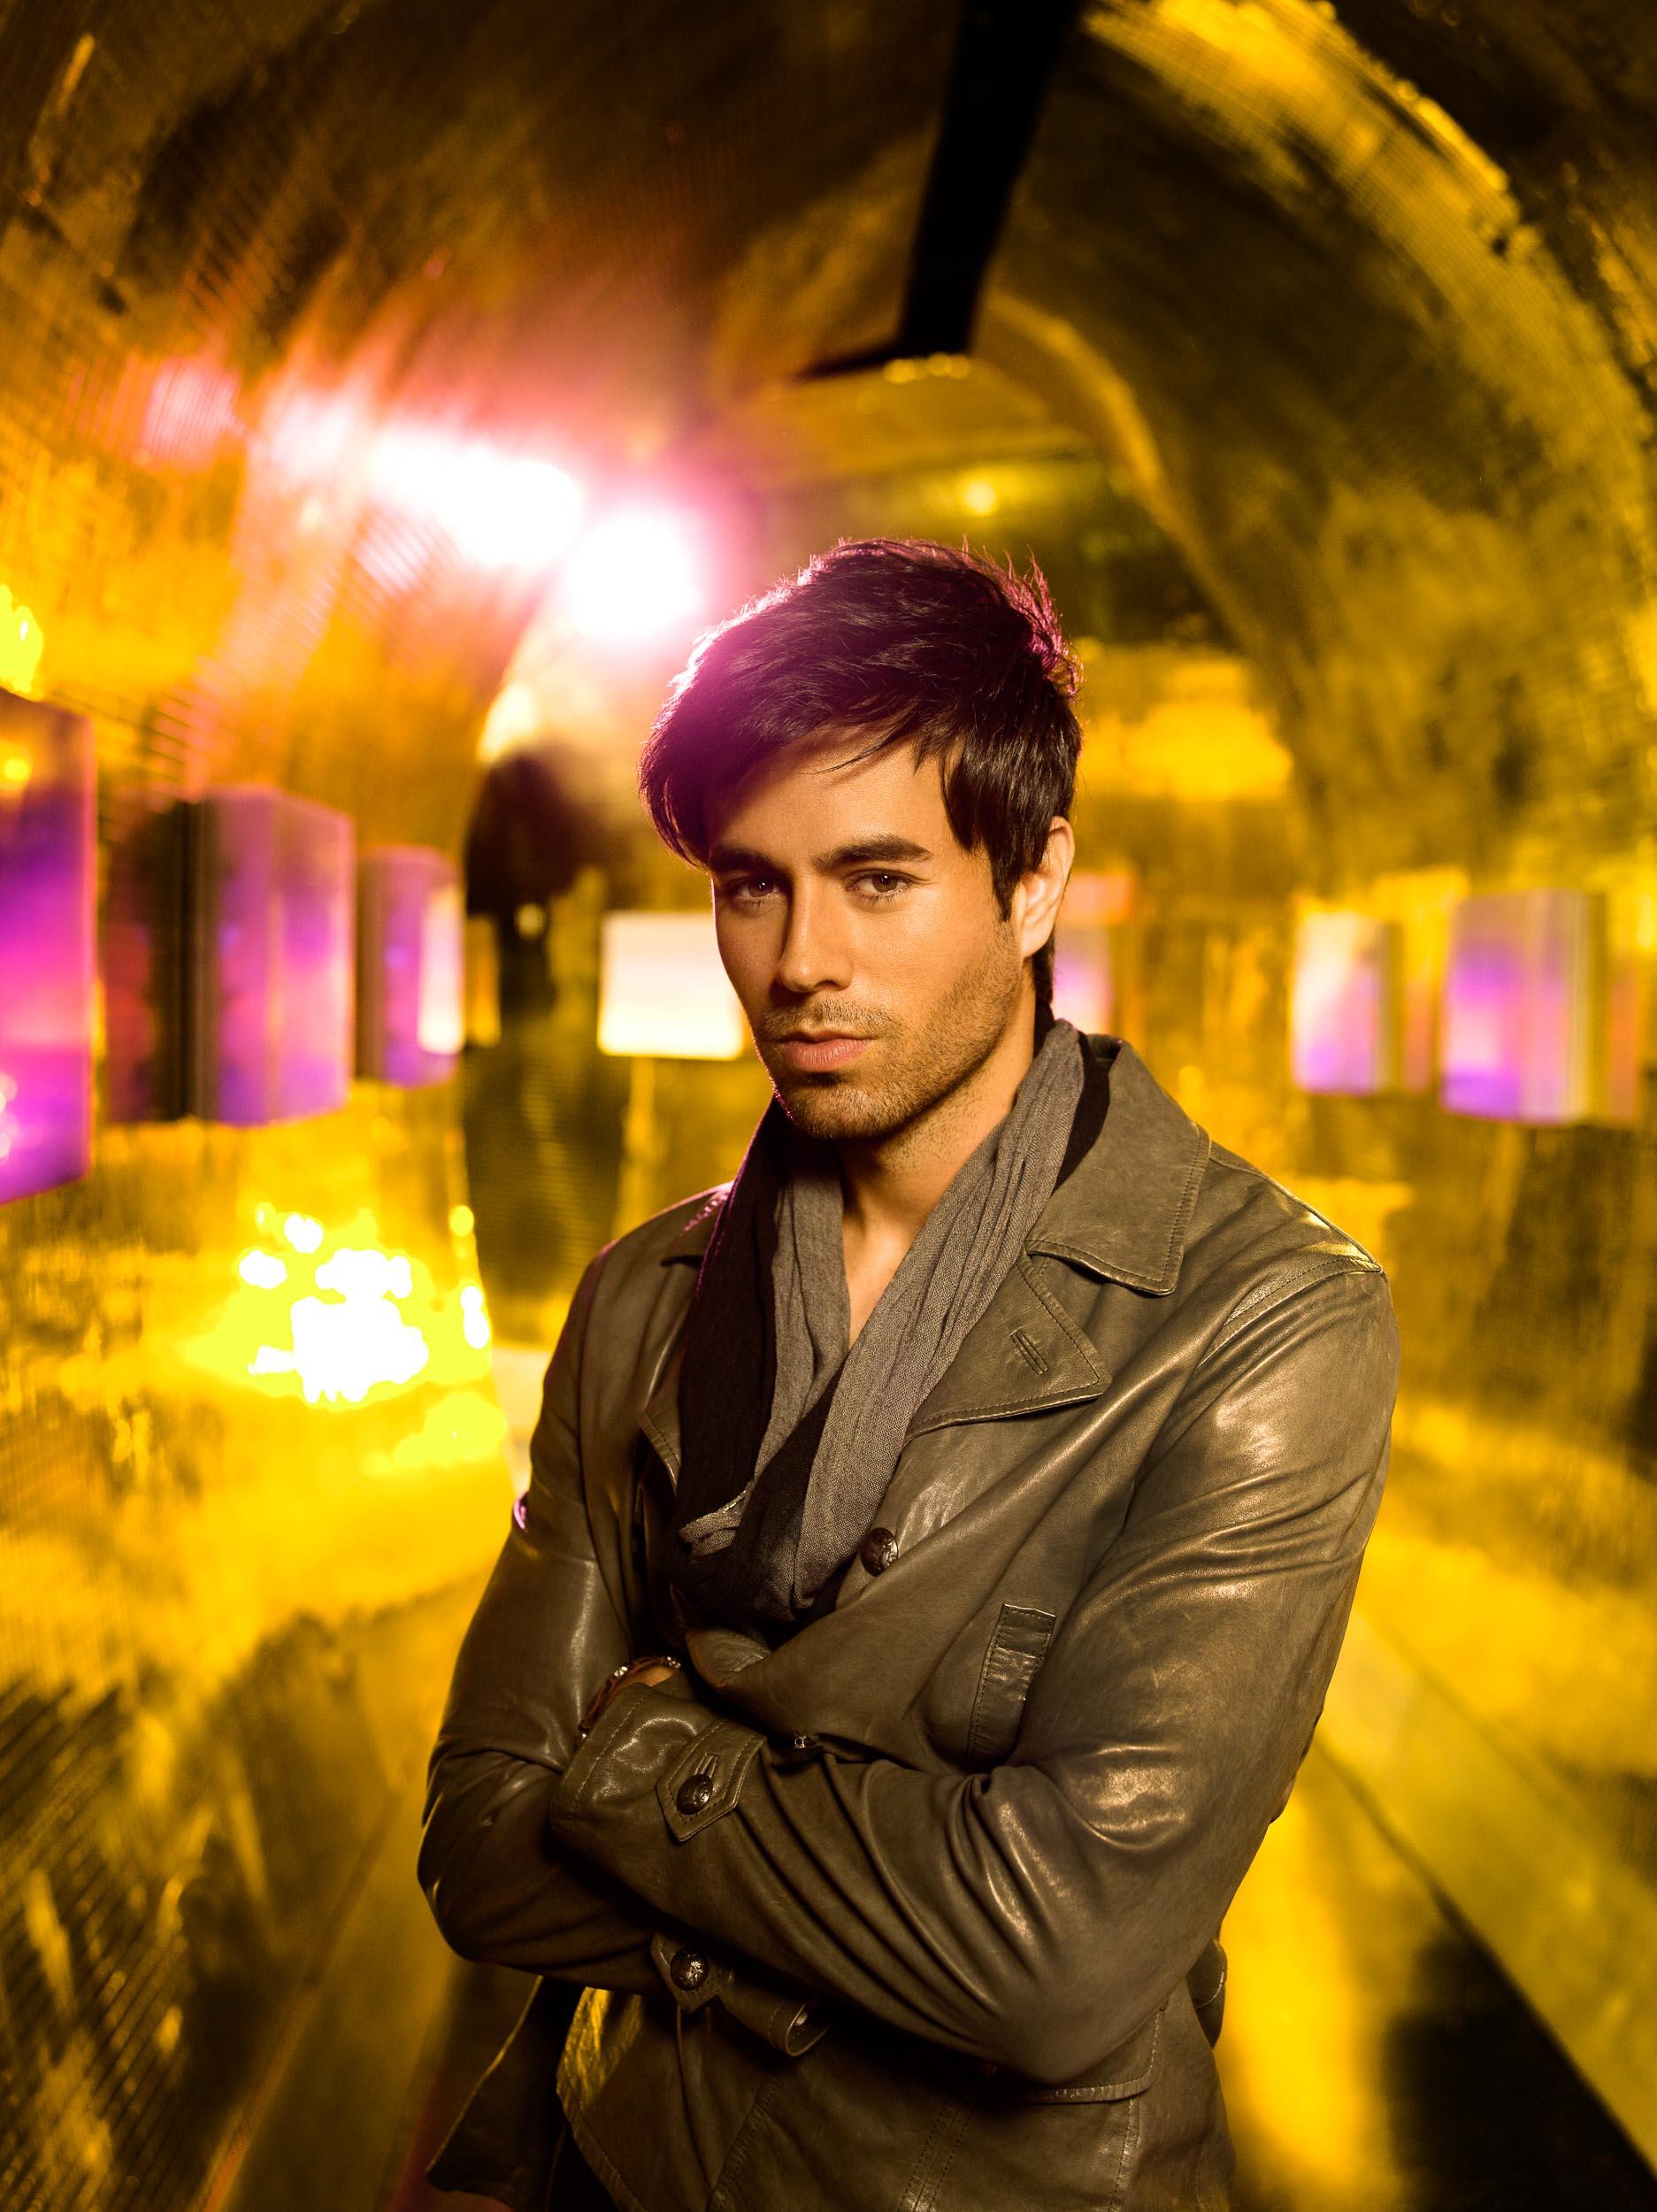 Enrique_Iglesias-Chapman_Baehler17.jpg